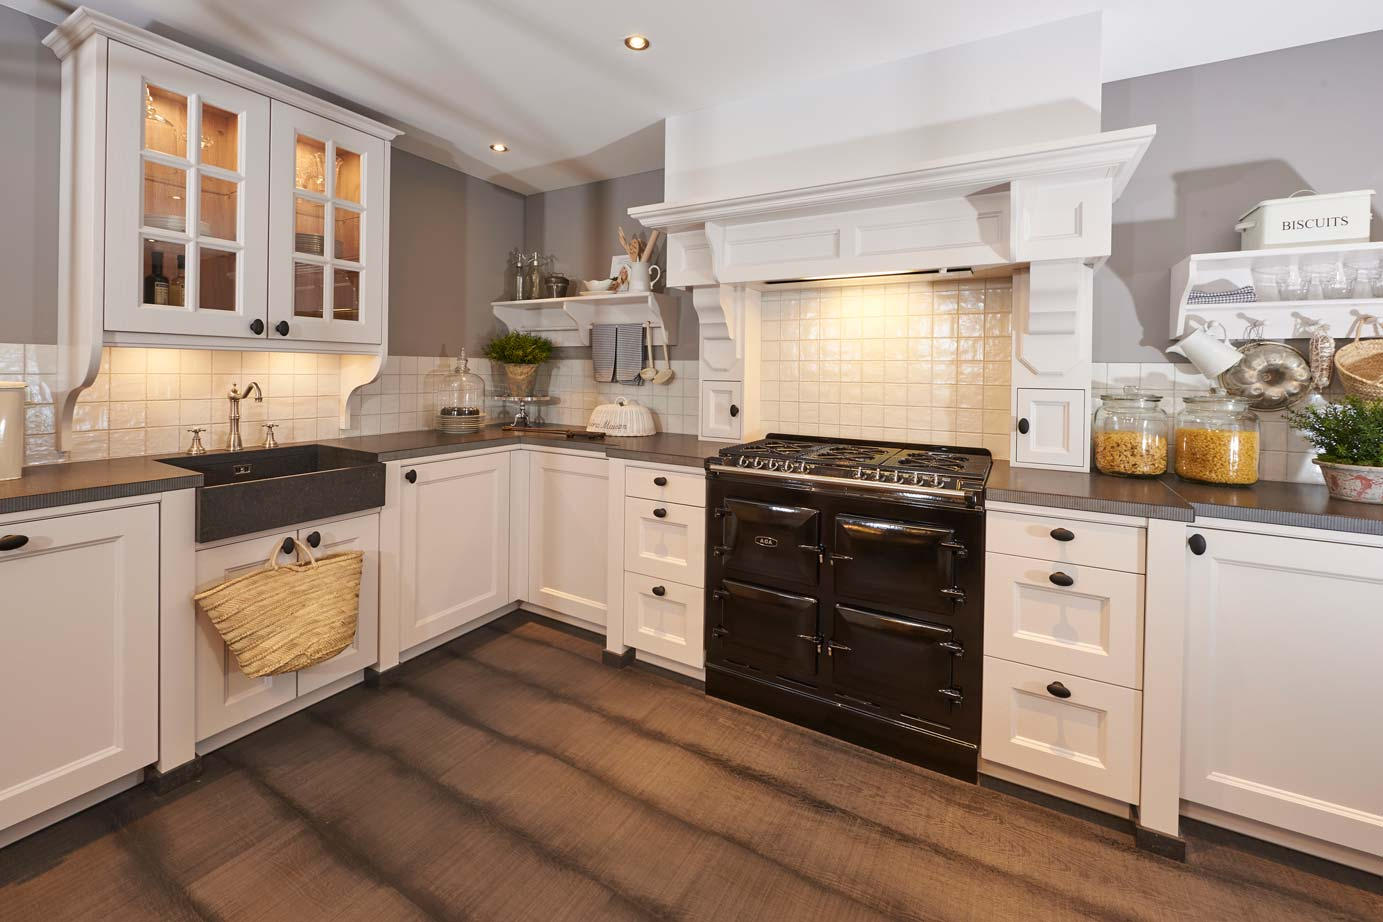 Interieur Klassieke Stijl : Klassieke keukens beleef de sfeer en rust van vroeger db keukens